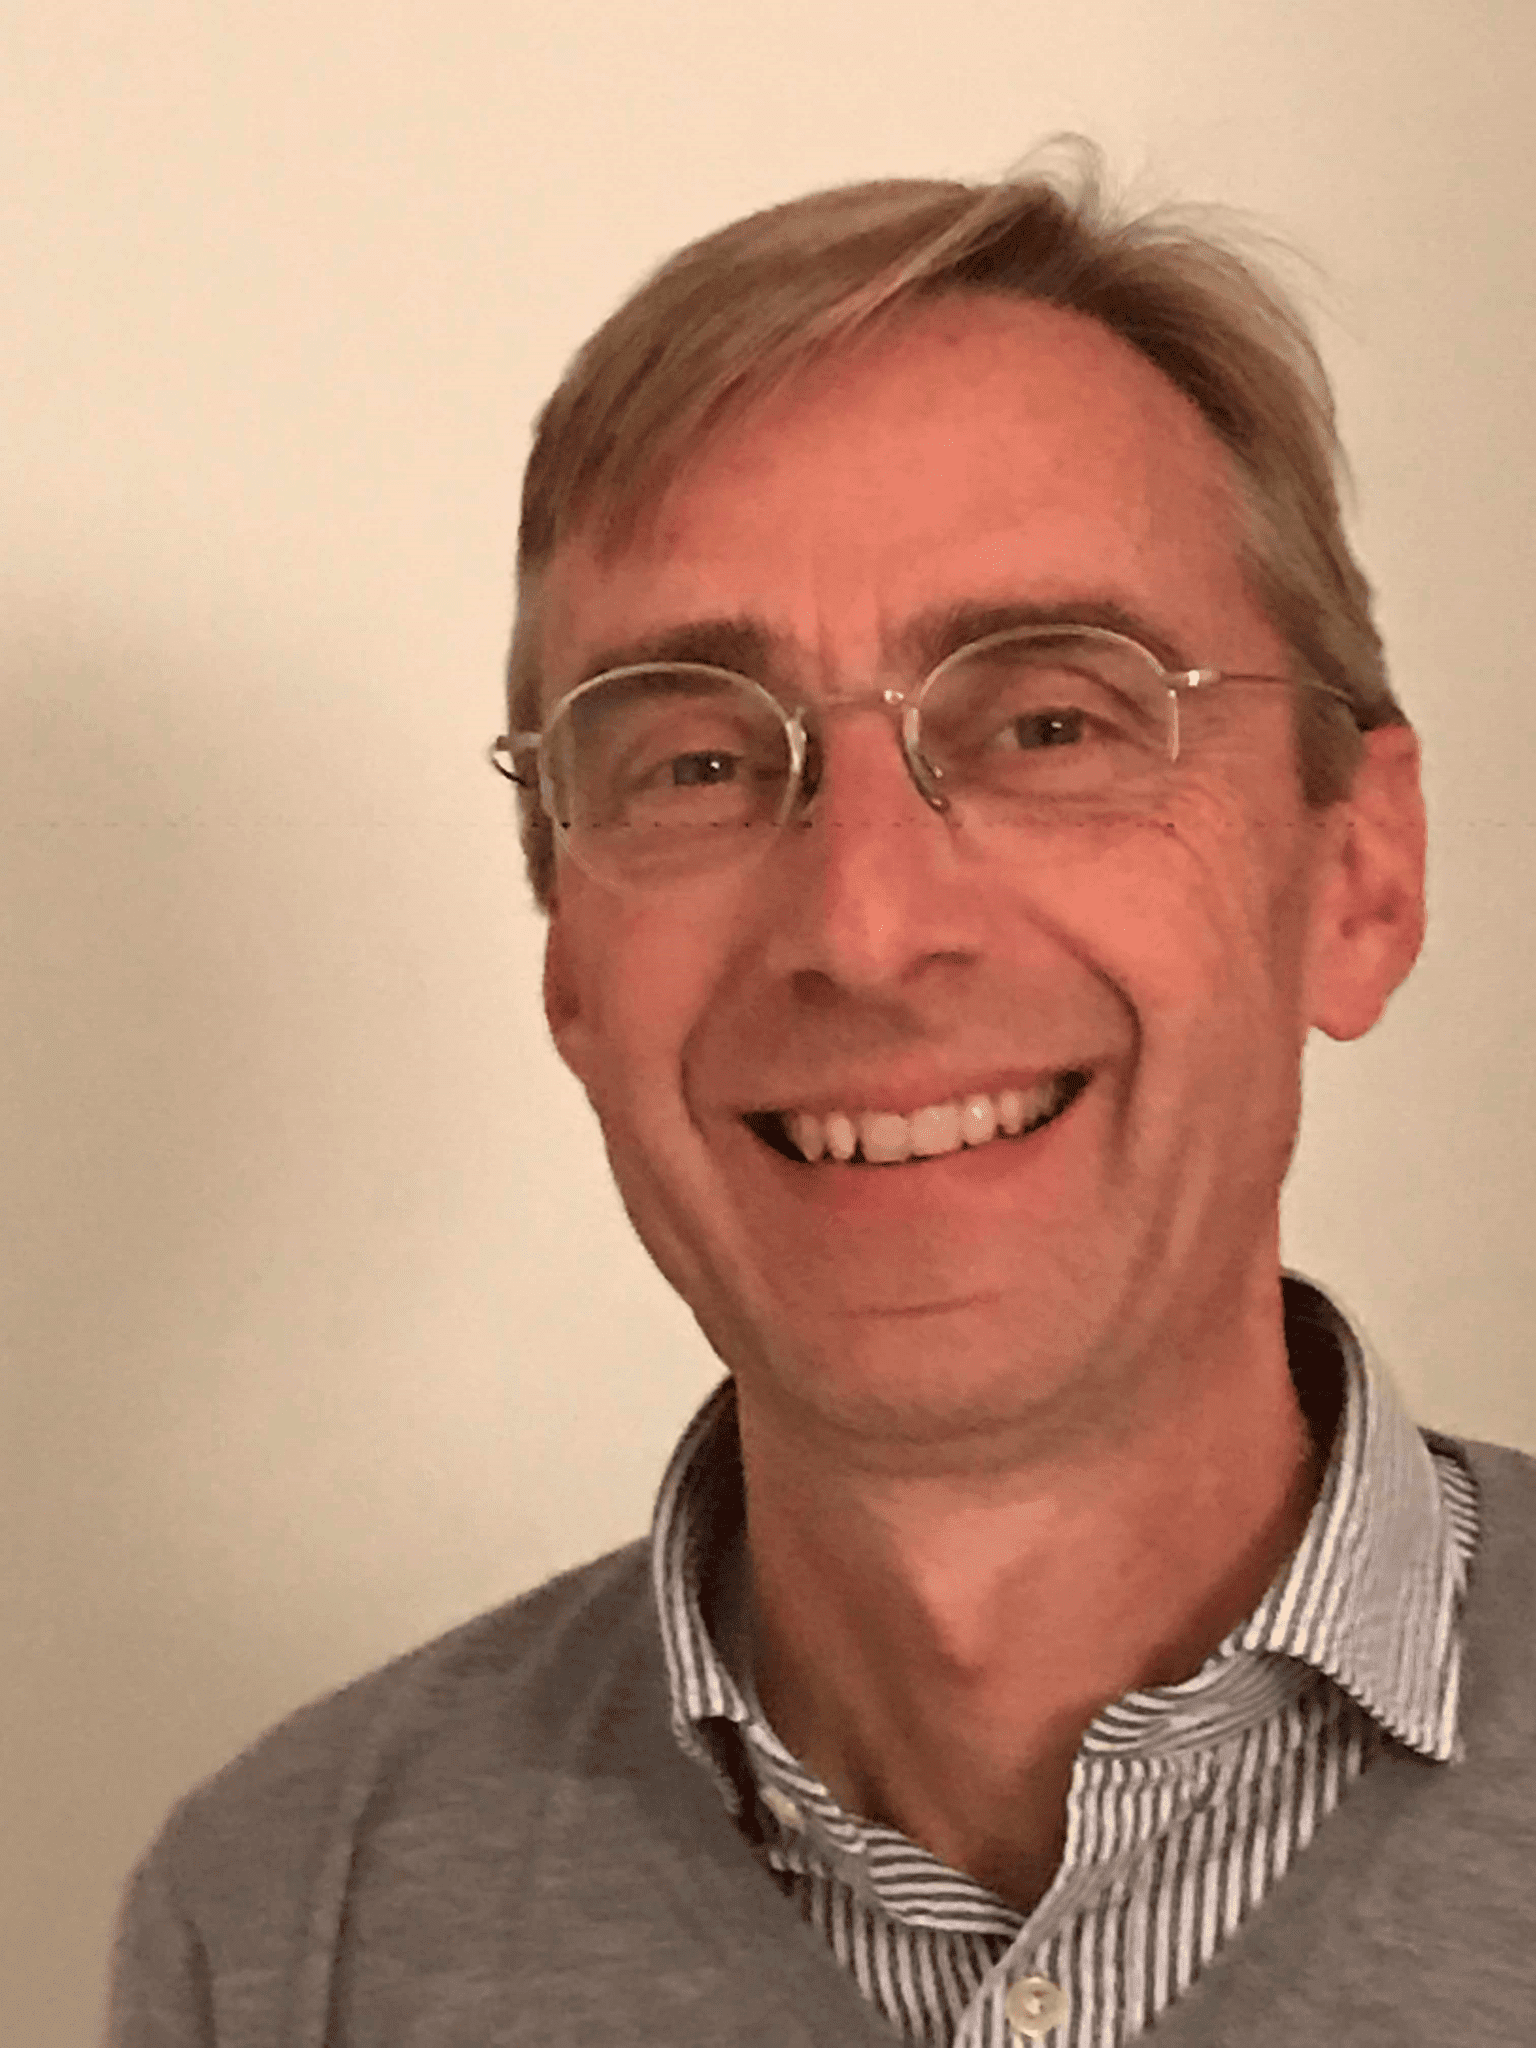 Dr. Jan Verfaillie